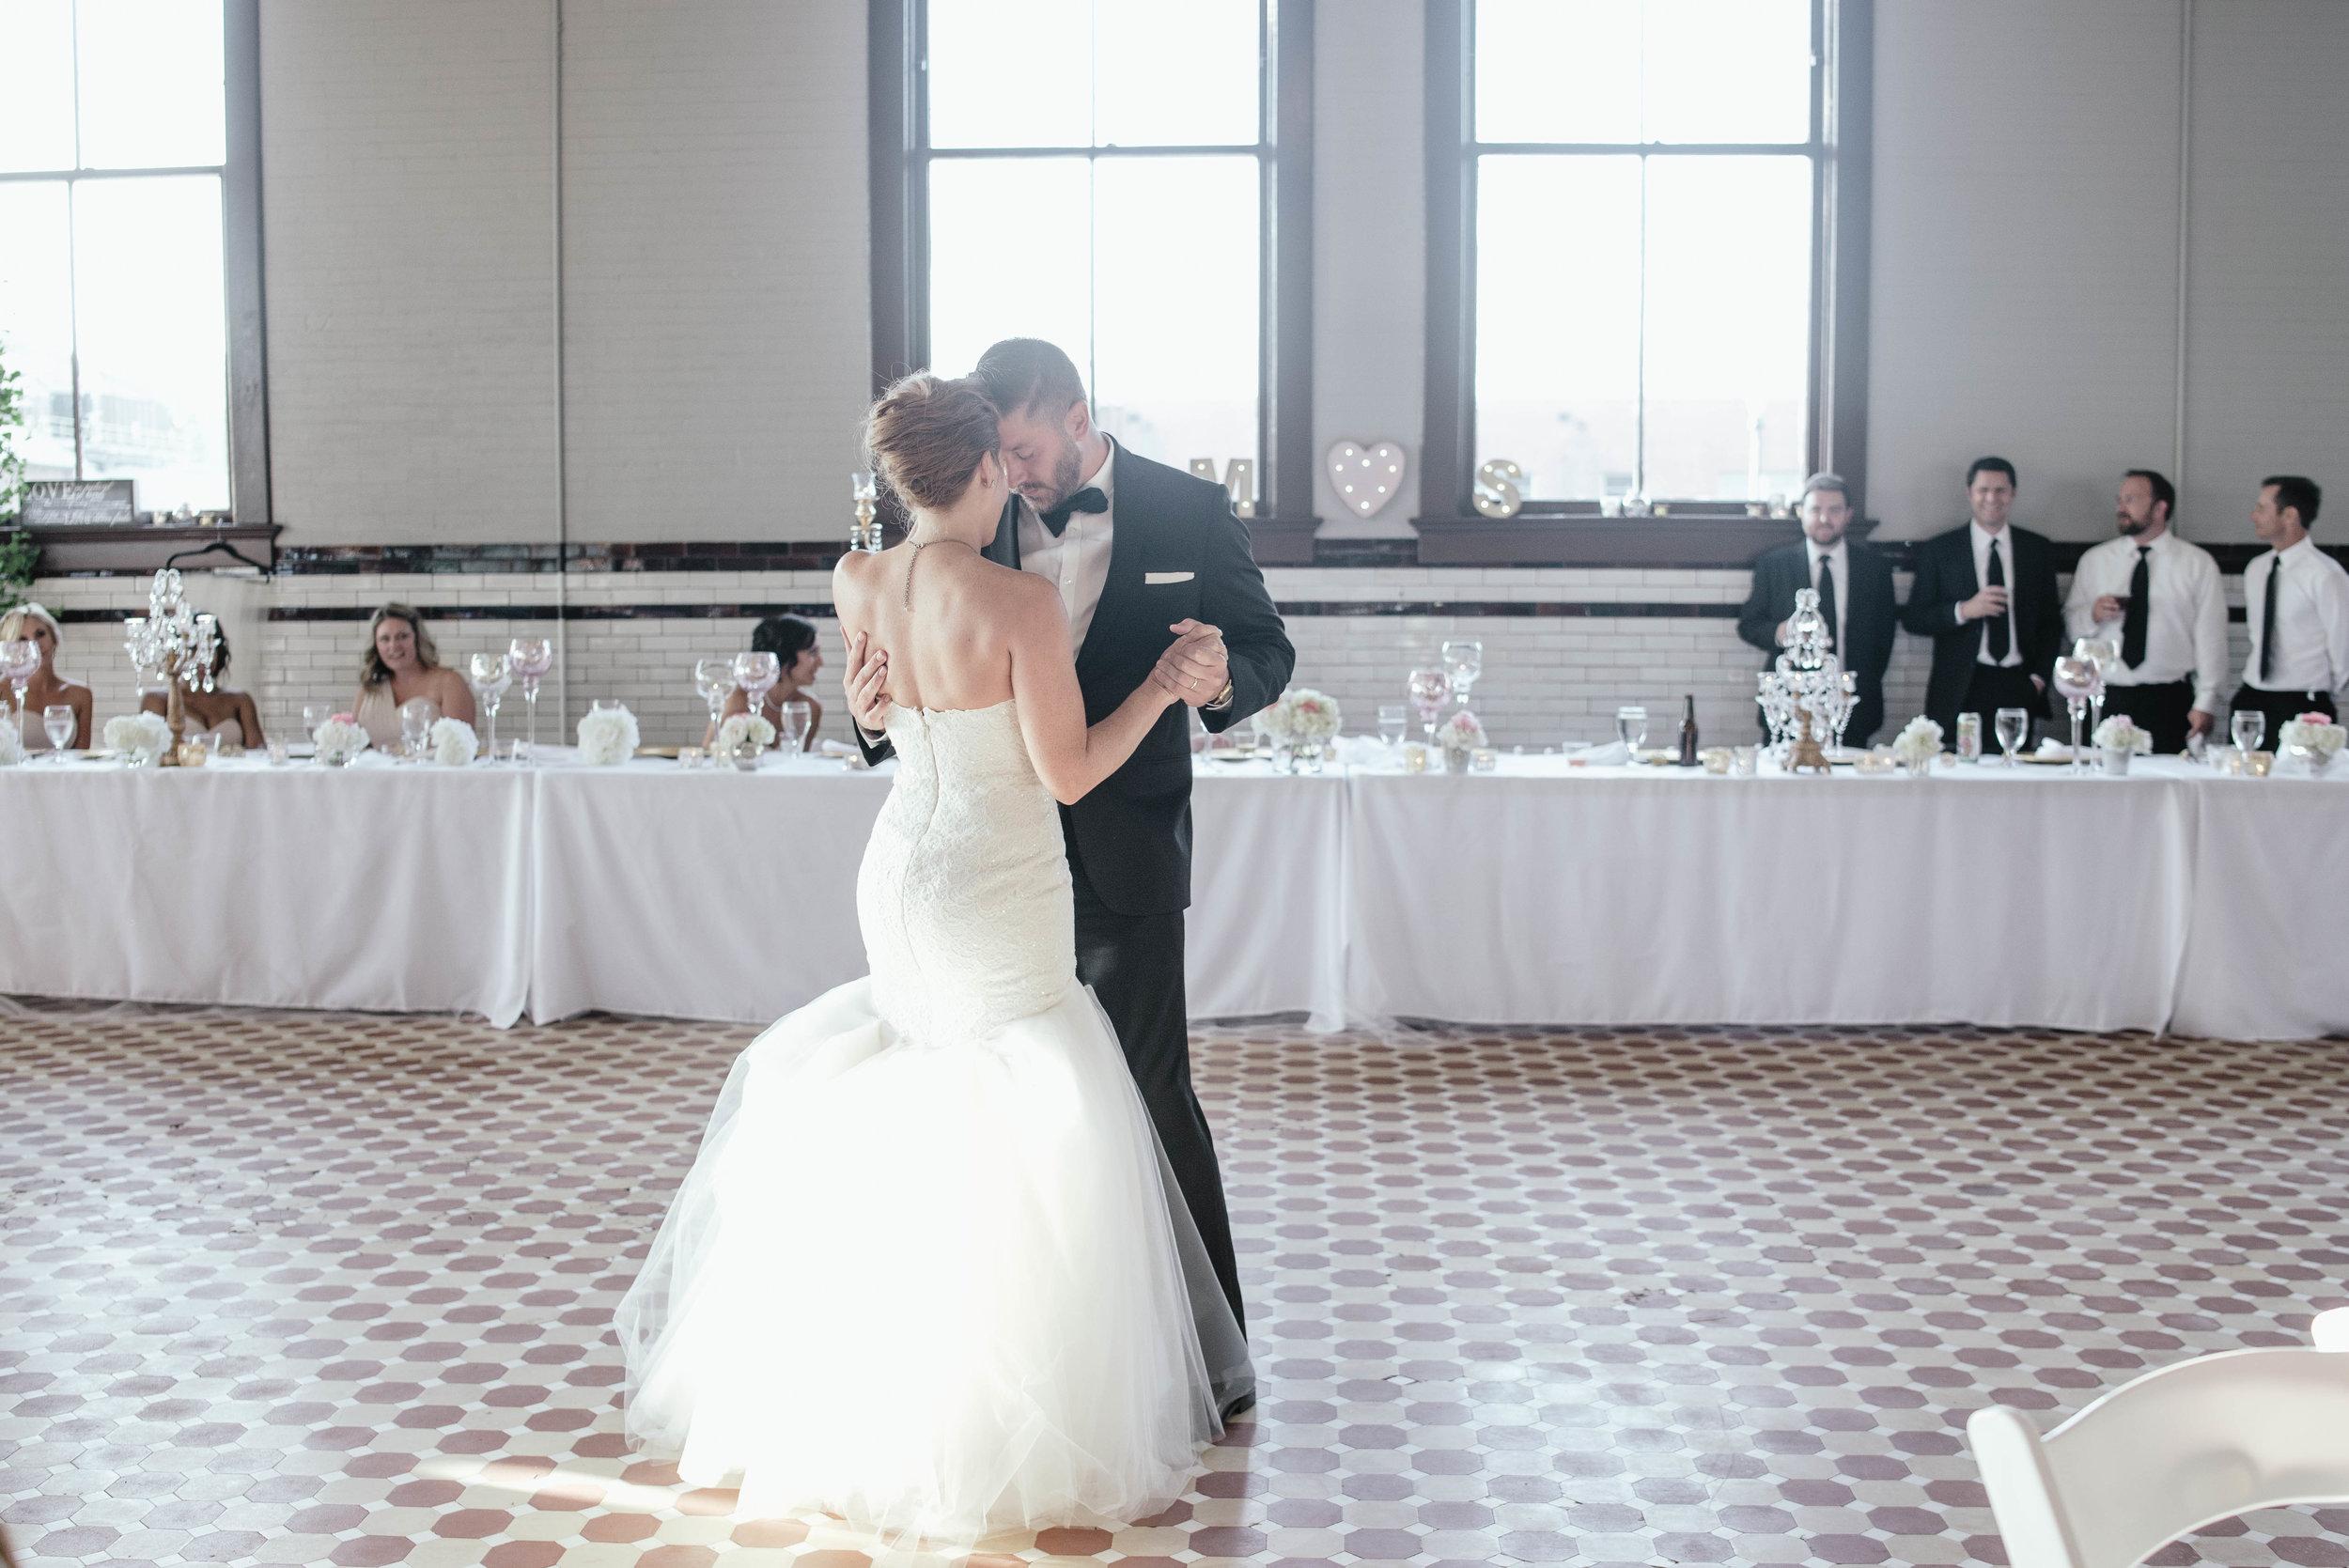 Mina-Steve-Blog-Indianapolis-Wedding-152.jpg